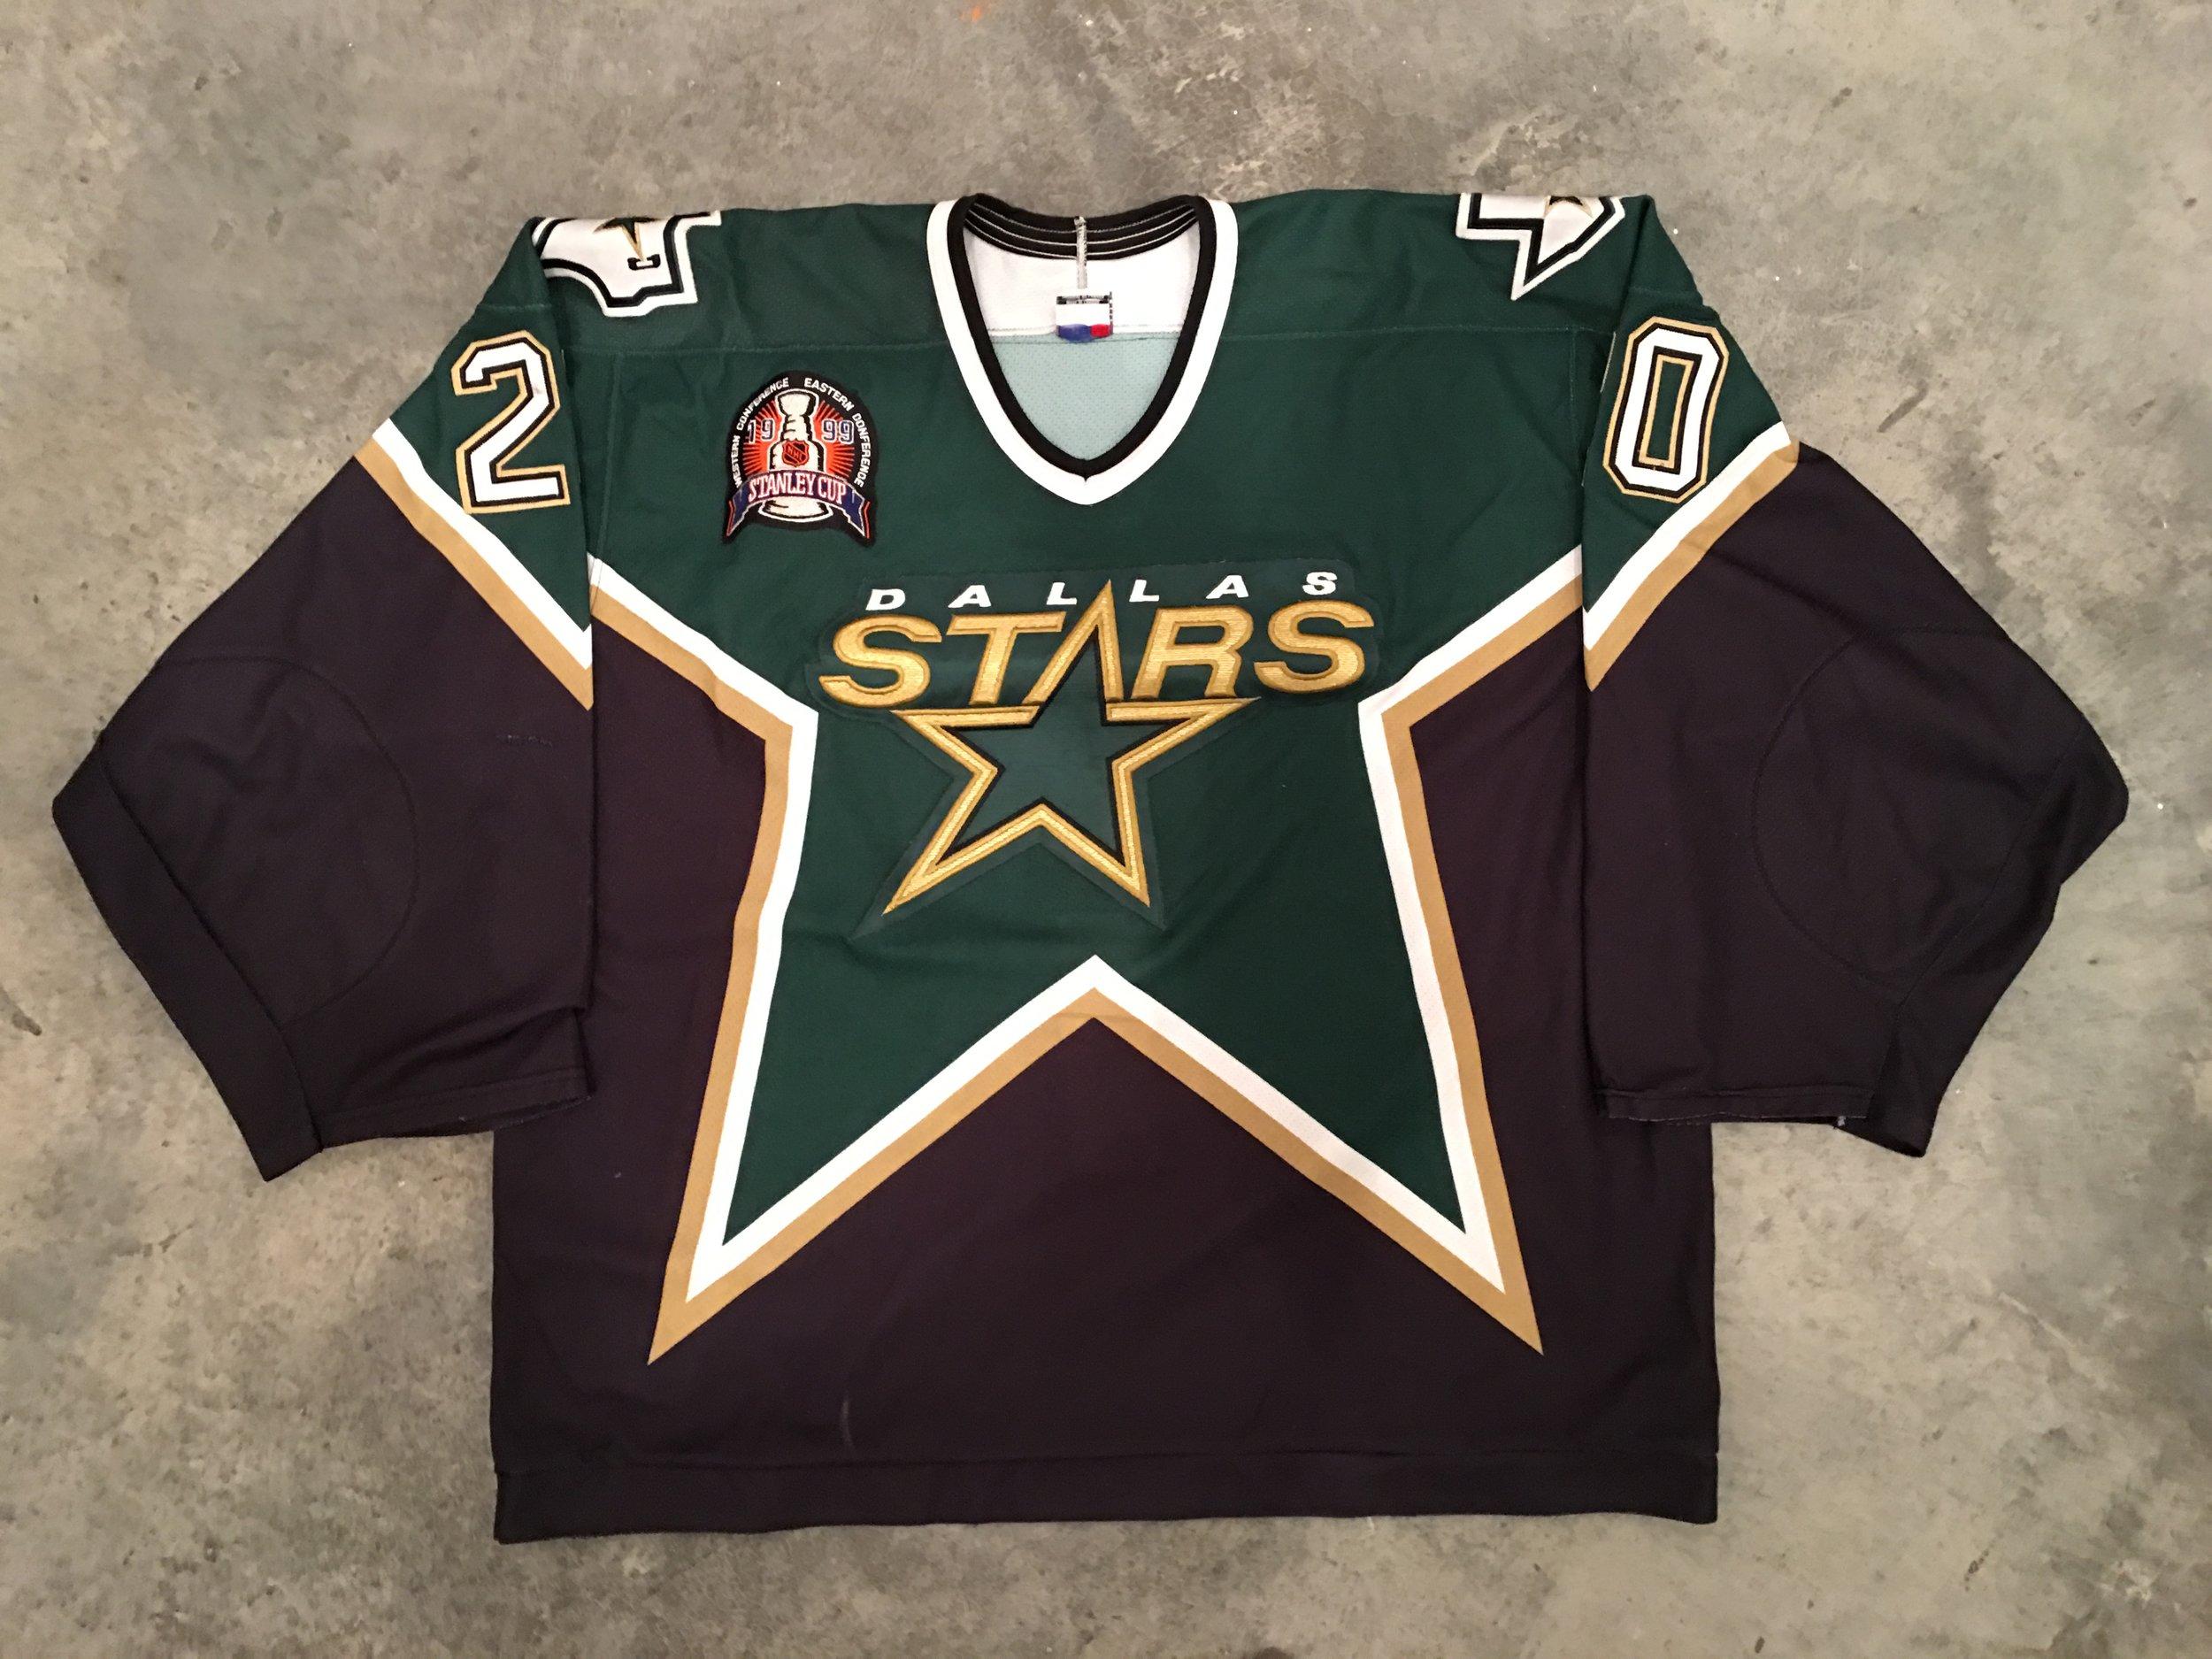 1999 Dallas Starts Stanley Cup Finals Game Worn Road Jersey - Ed Belfour